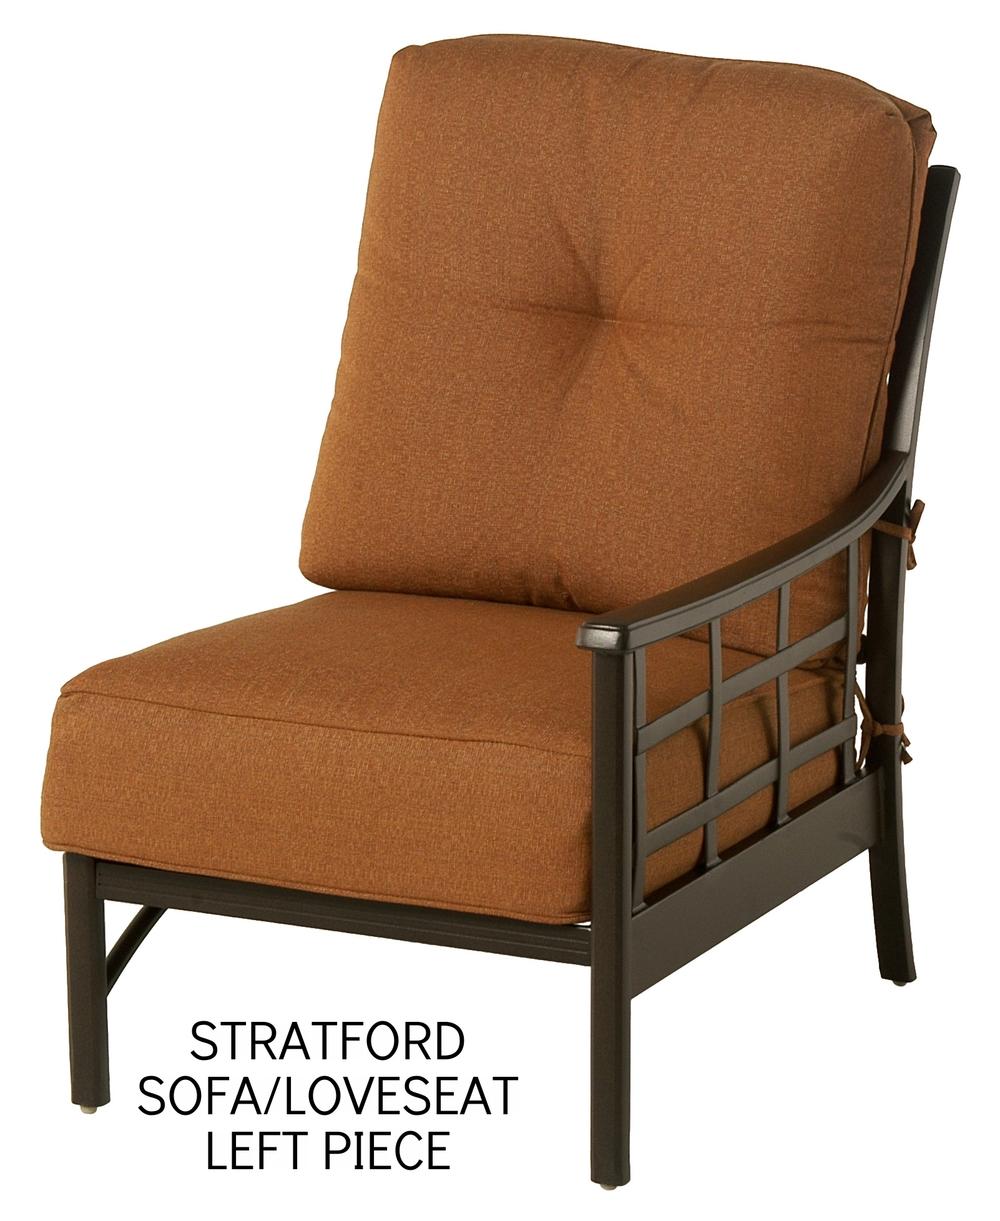 Stratford Estate Love Seat Club Left Chair.jpg